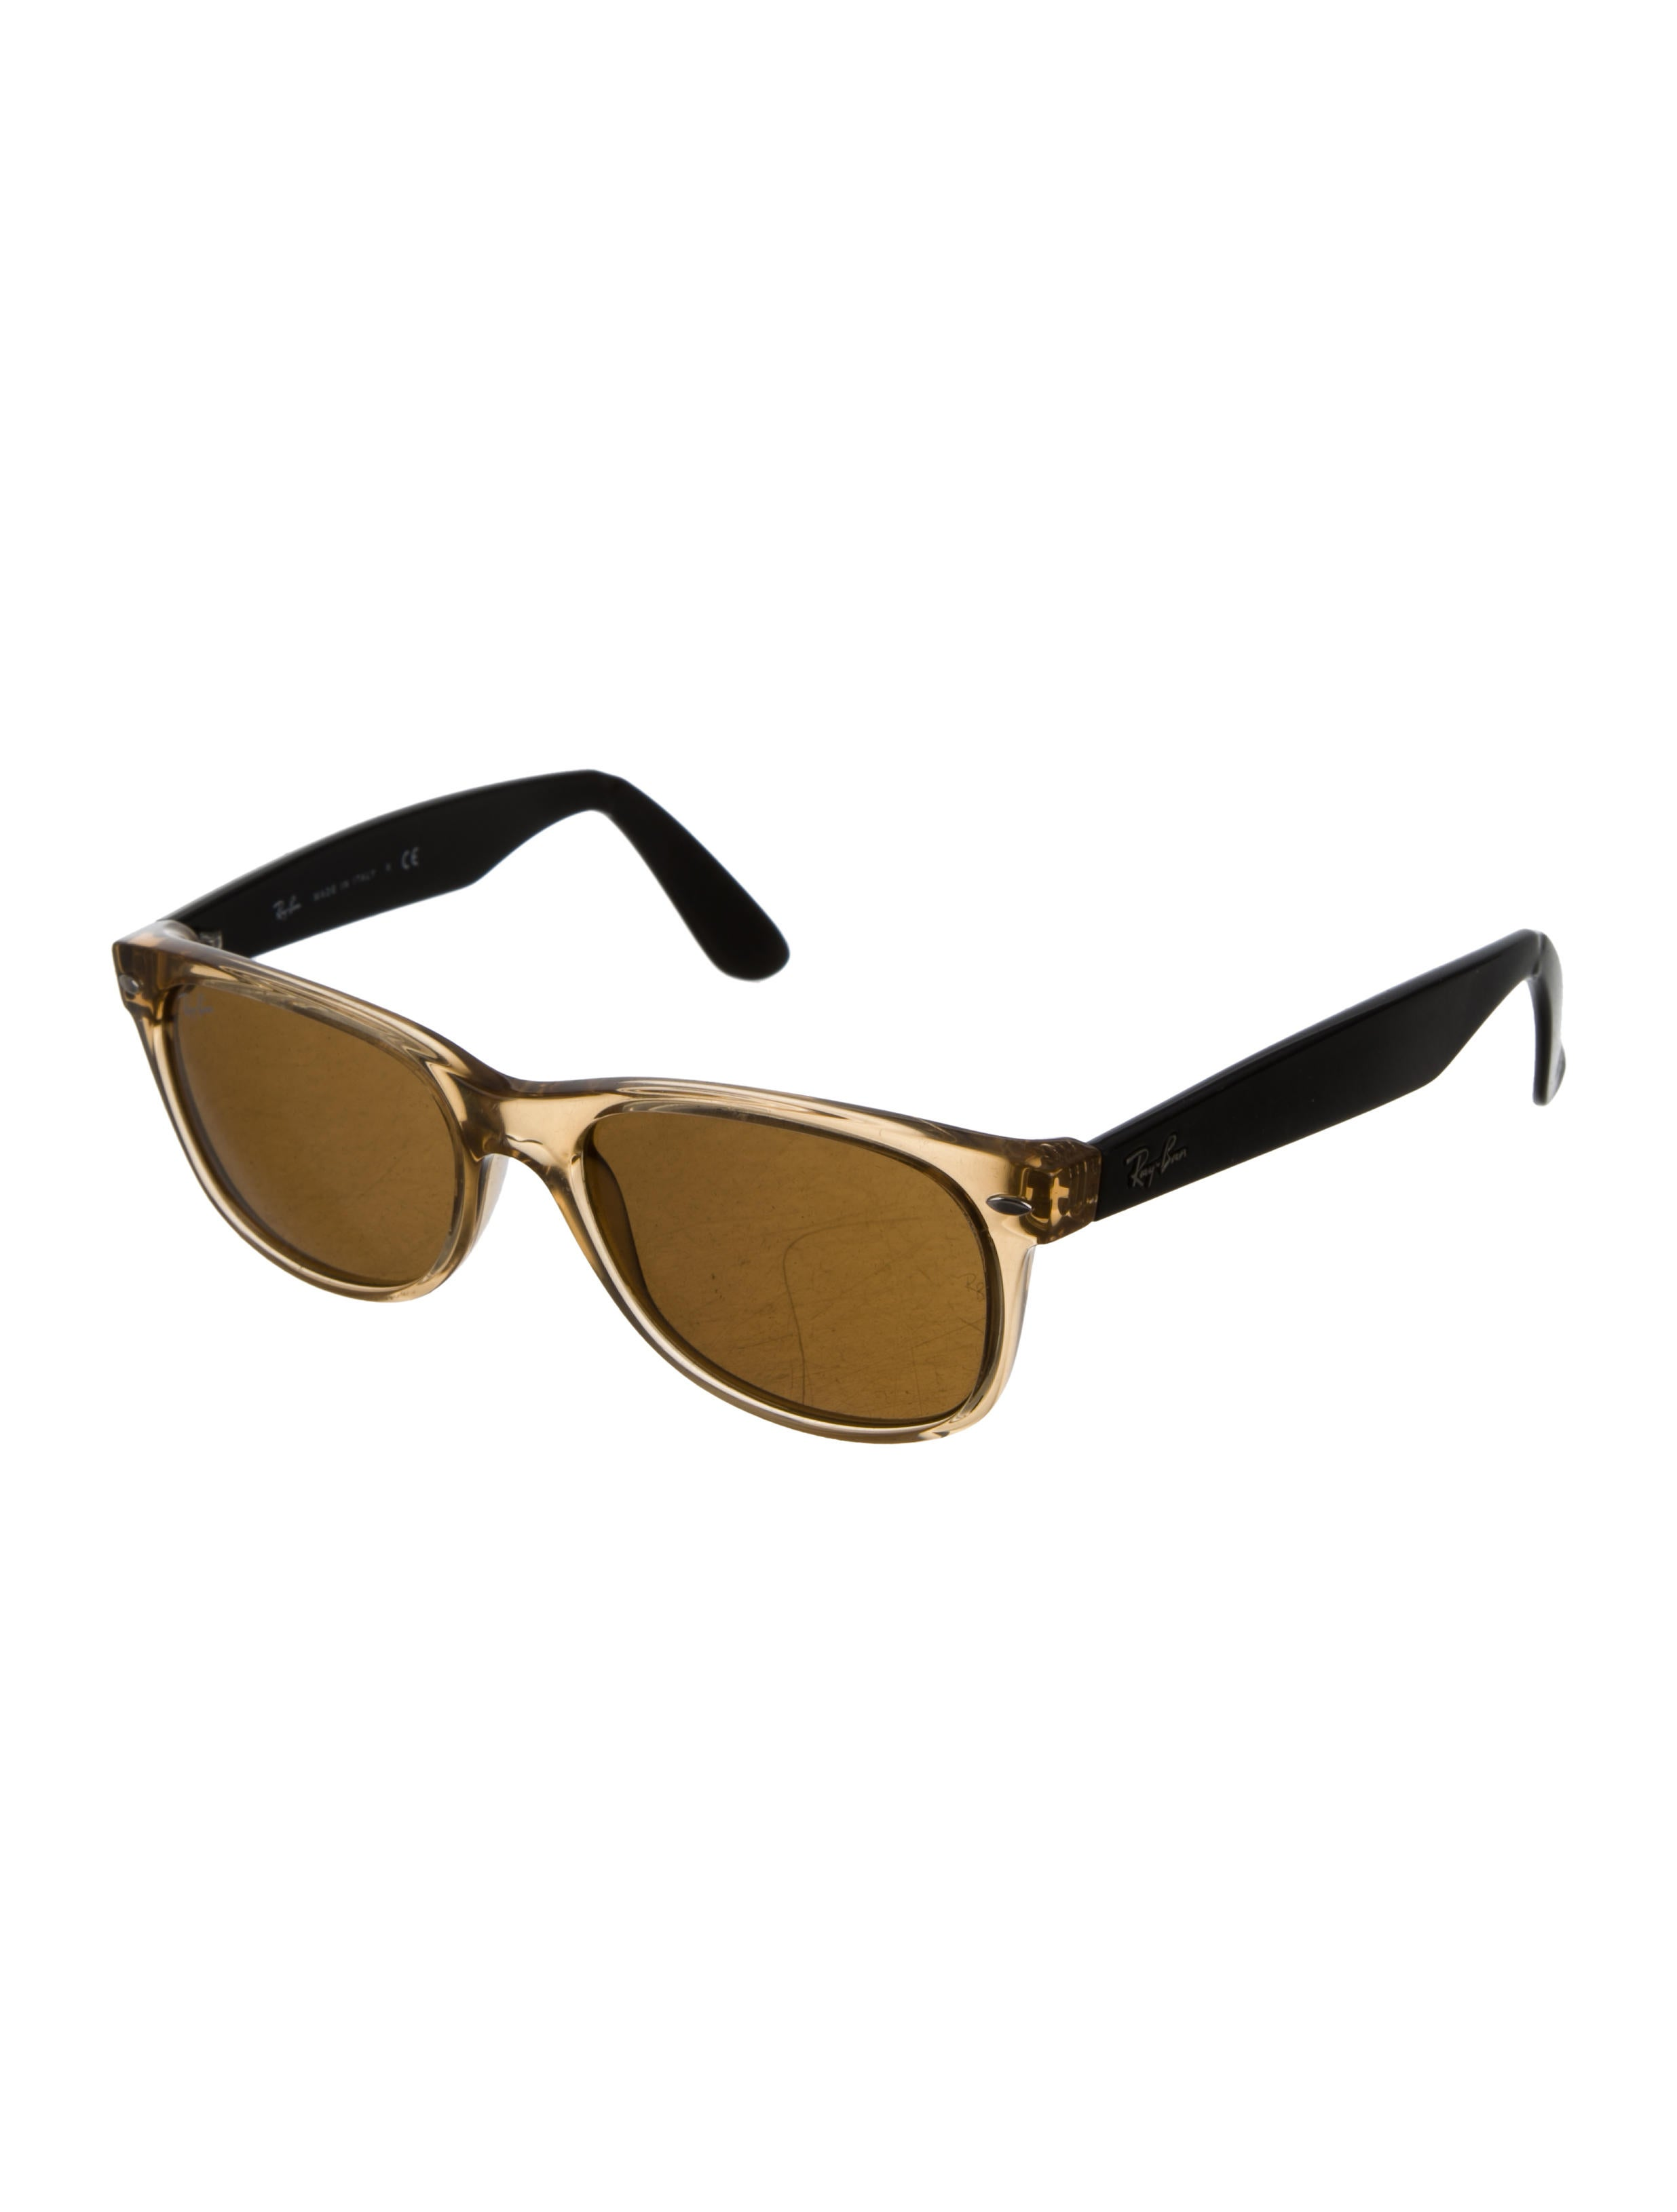 afabec469e Ray Bans Outdoor Sunglasses Wayfarer « Heritage Malta